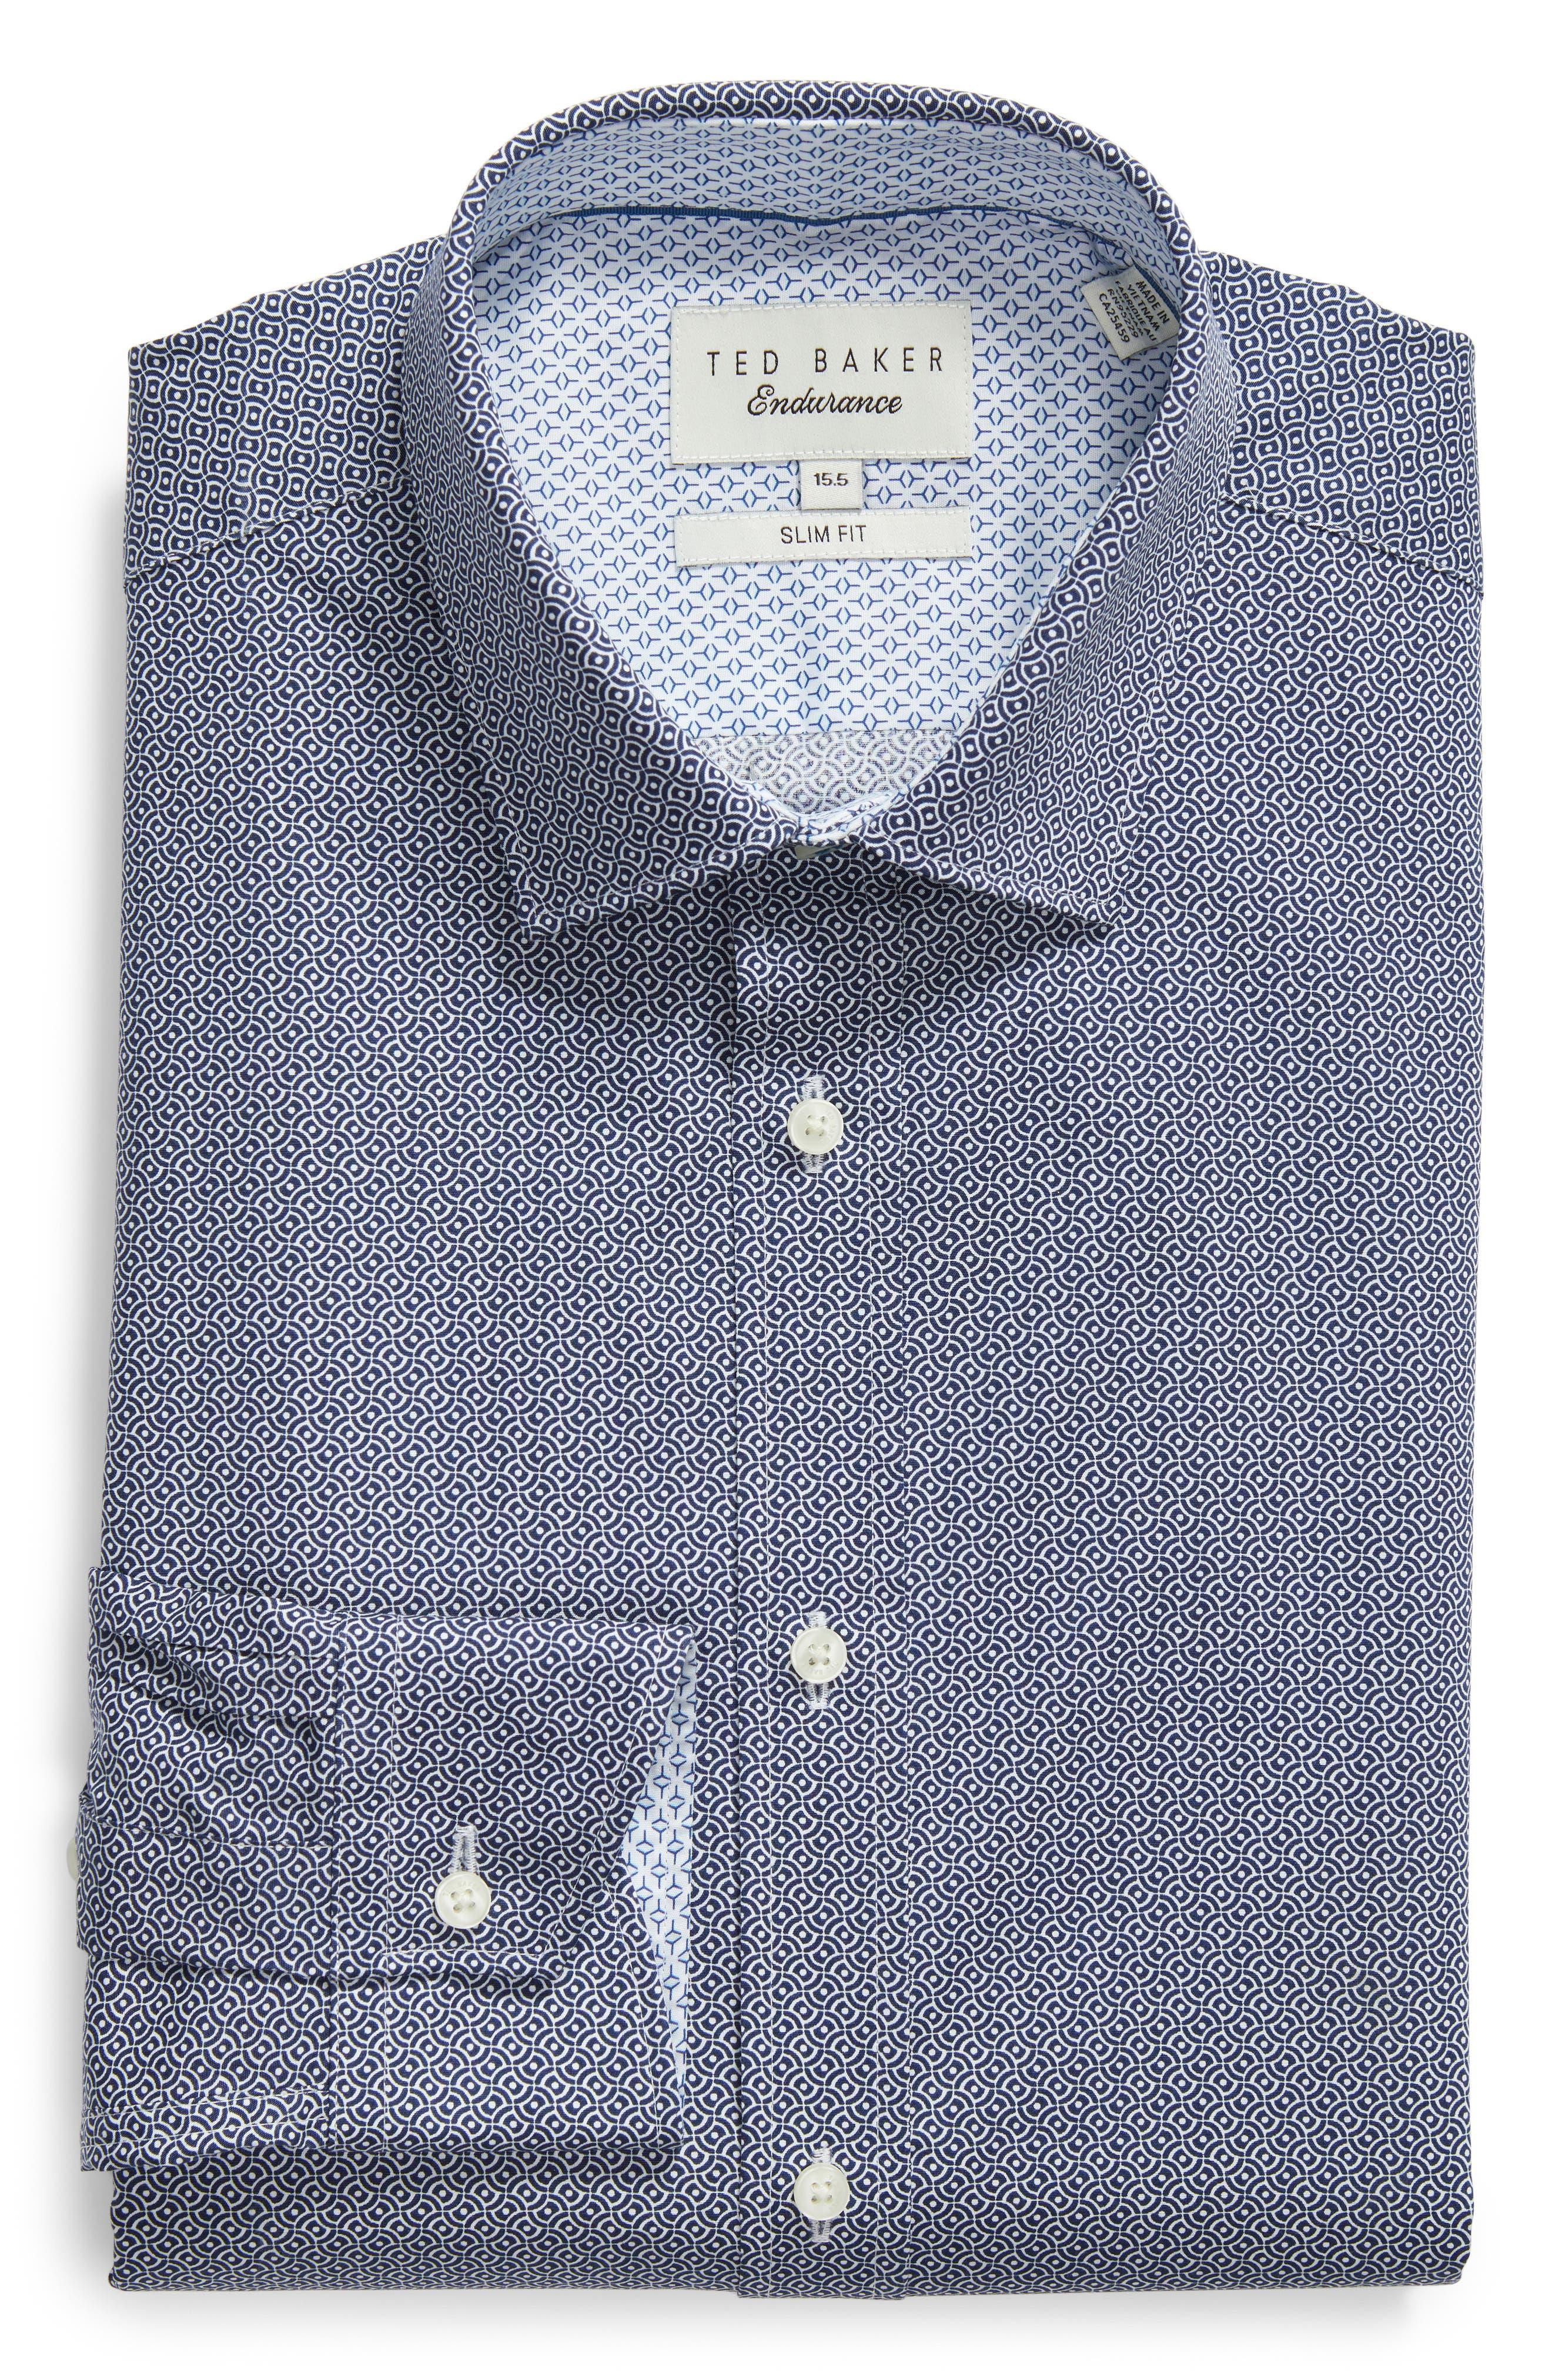 Footz Slim Fit Geometric Dress Shirt,                             Alternate thumbnail 5, color,                             NAVY